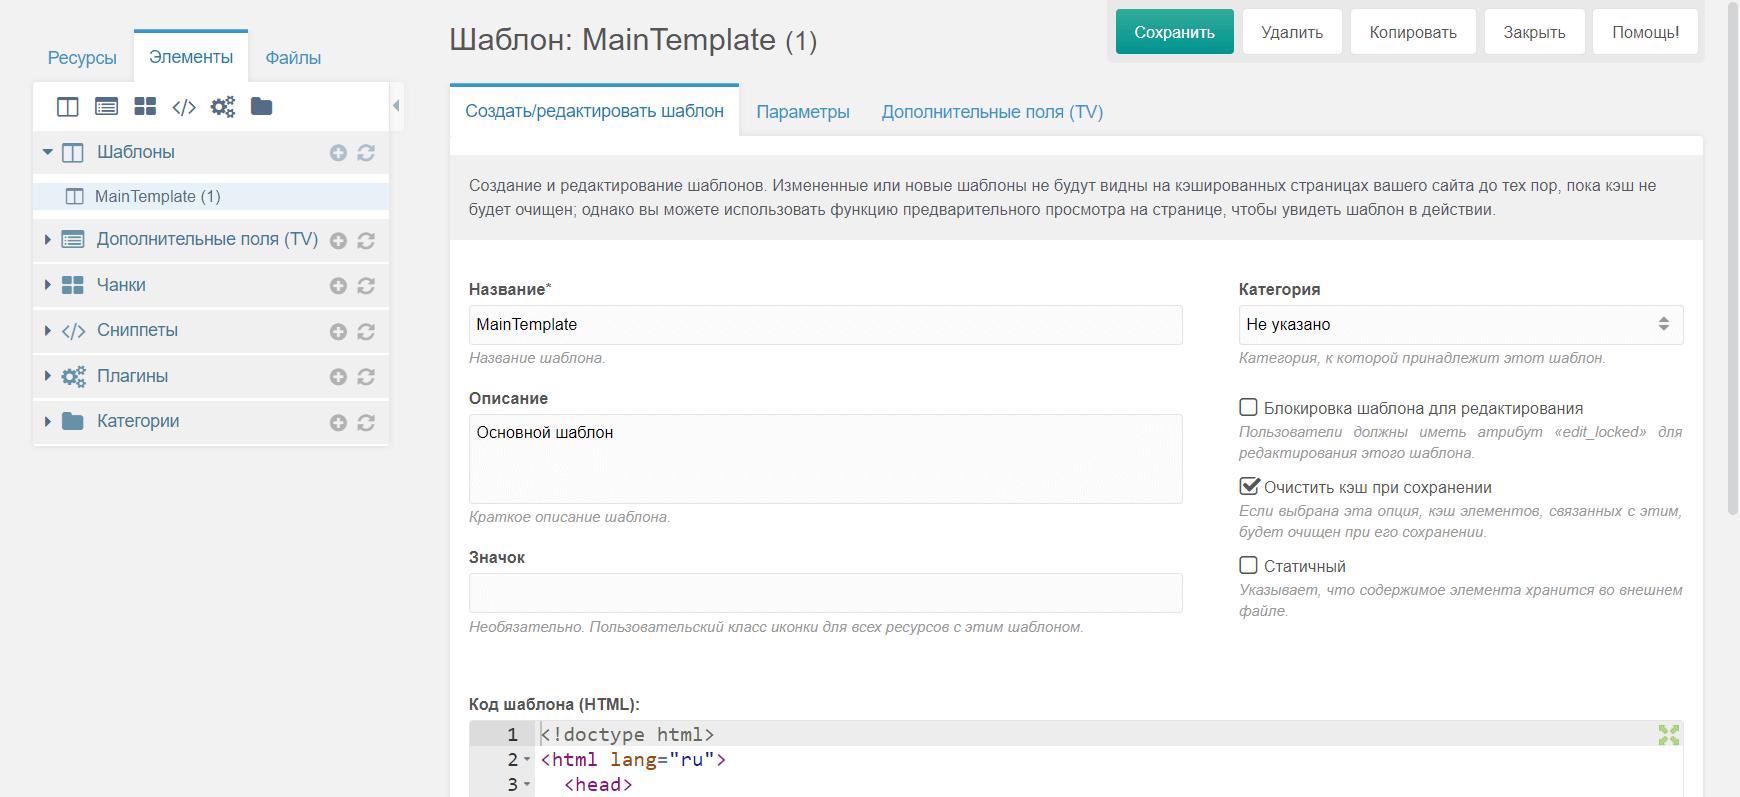 Шаблон, к которому подключён фреймворк Bootstrap 5